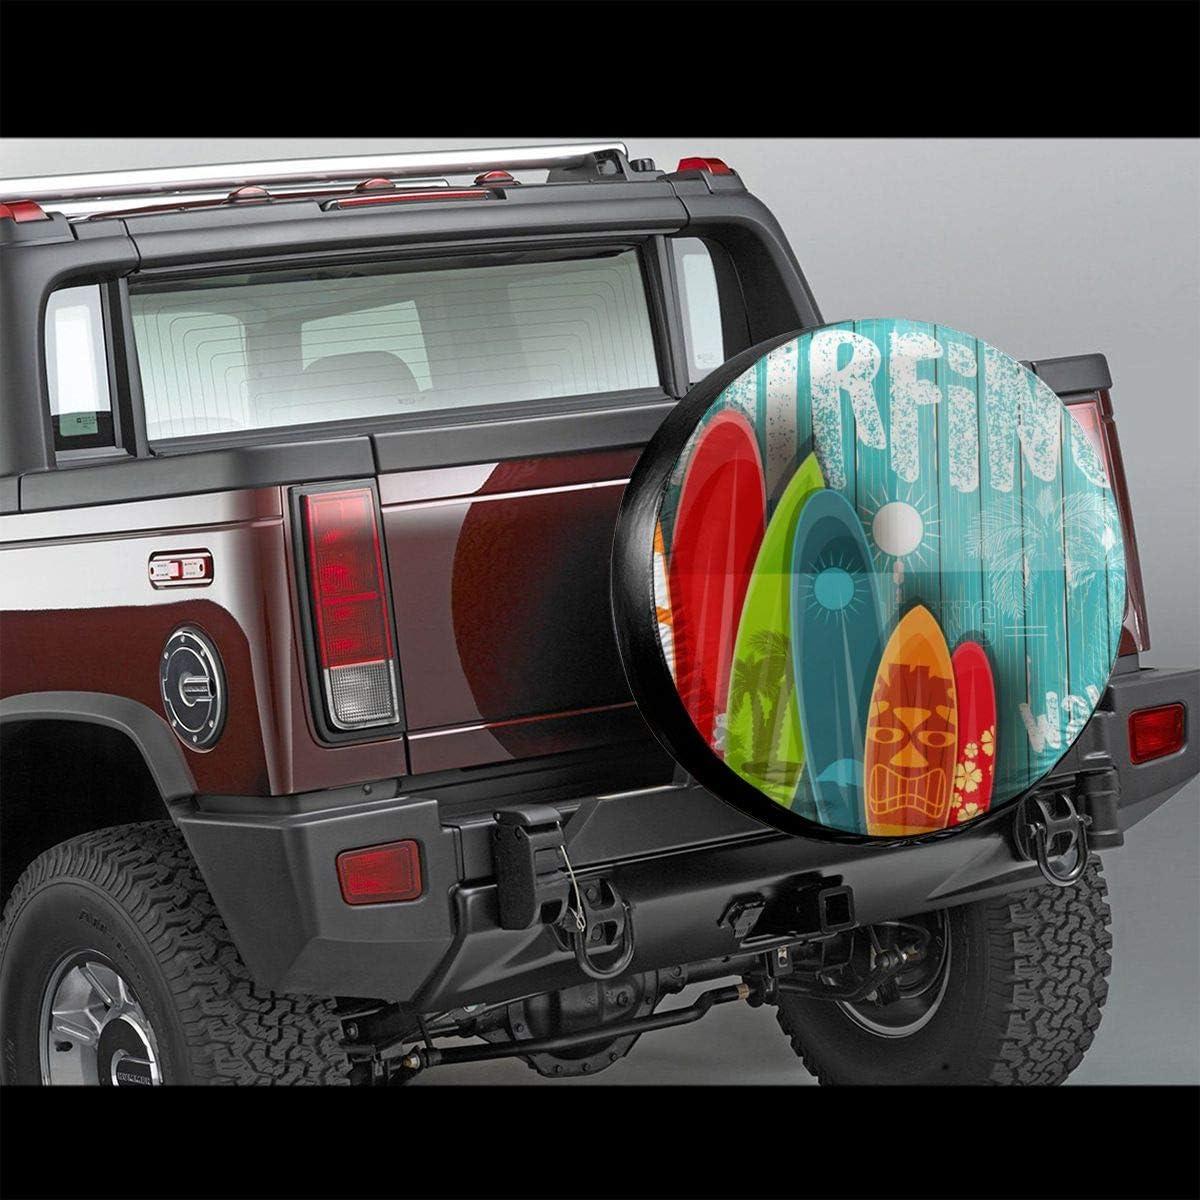 Waterproof UV Sun RV Trailer Tire Protectors Baby Goat Smile Moment Fit 23.6 to 27.1 Truck Camper Van Auto Car Tires Diameter AMRANDOM Wheel Tire Covers